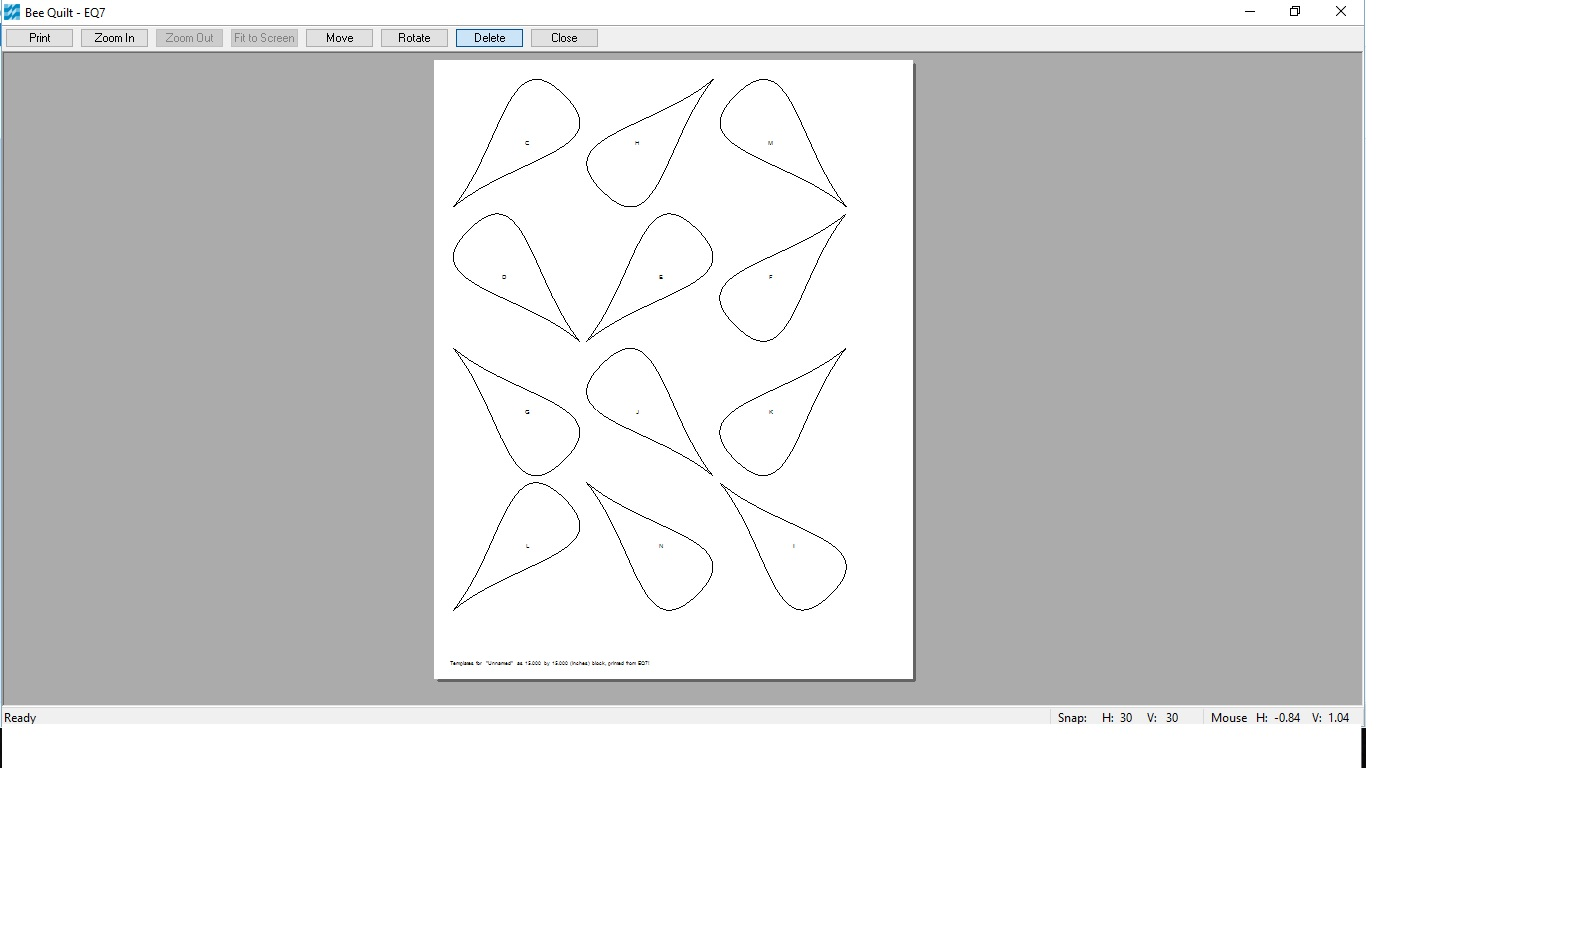 Pamelaquilts: EQ25 - Using EQ7 to print templates for Applique